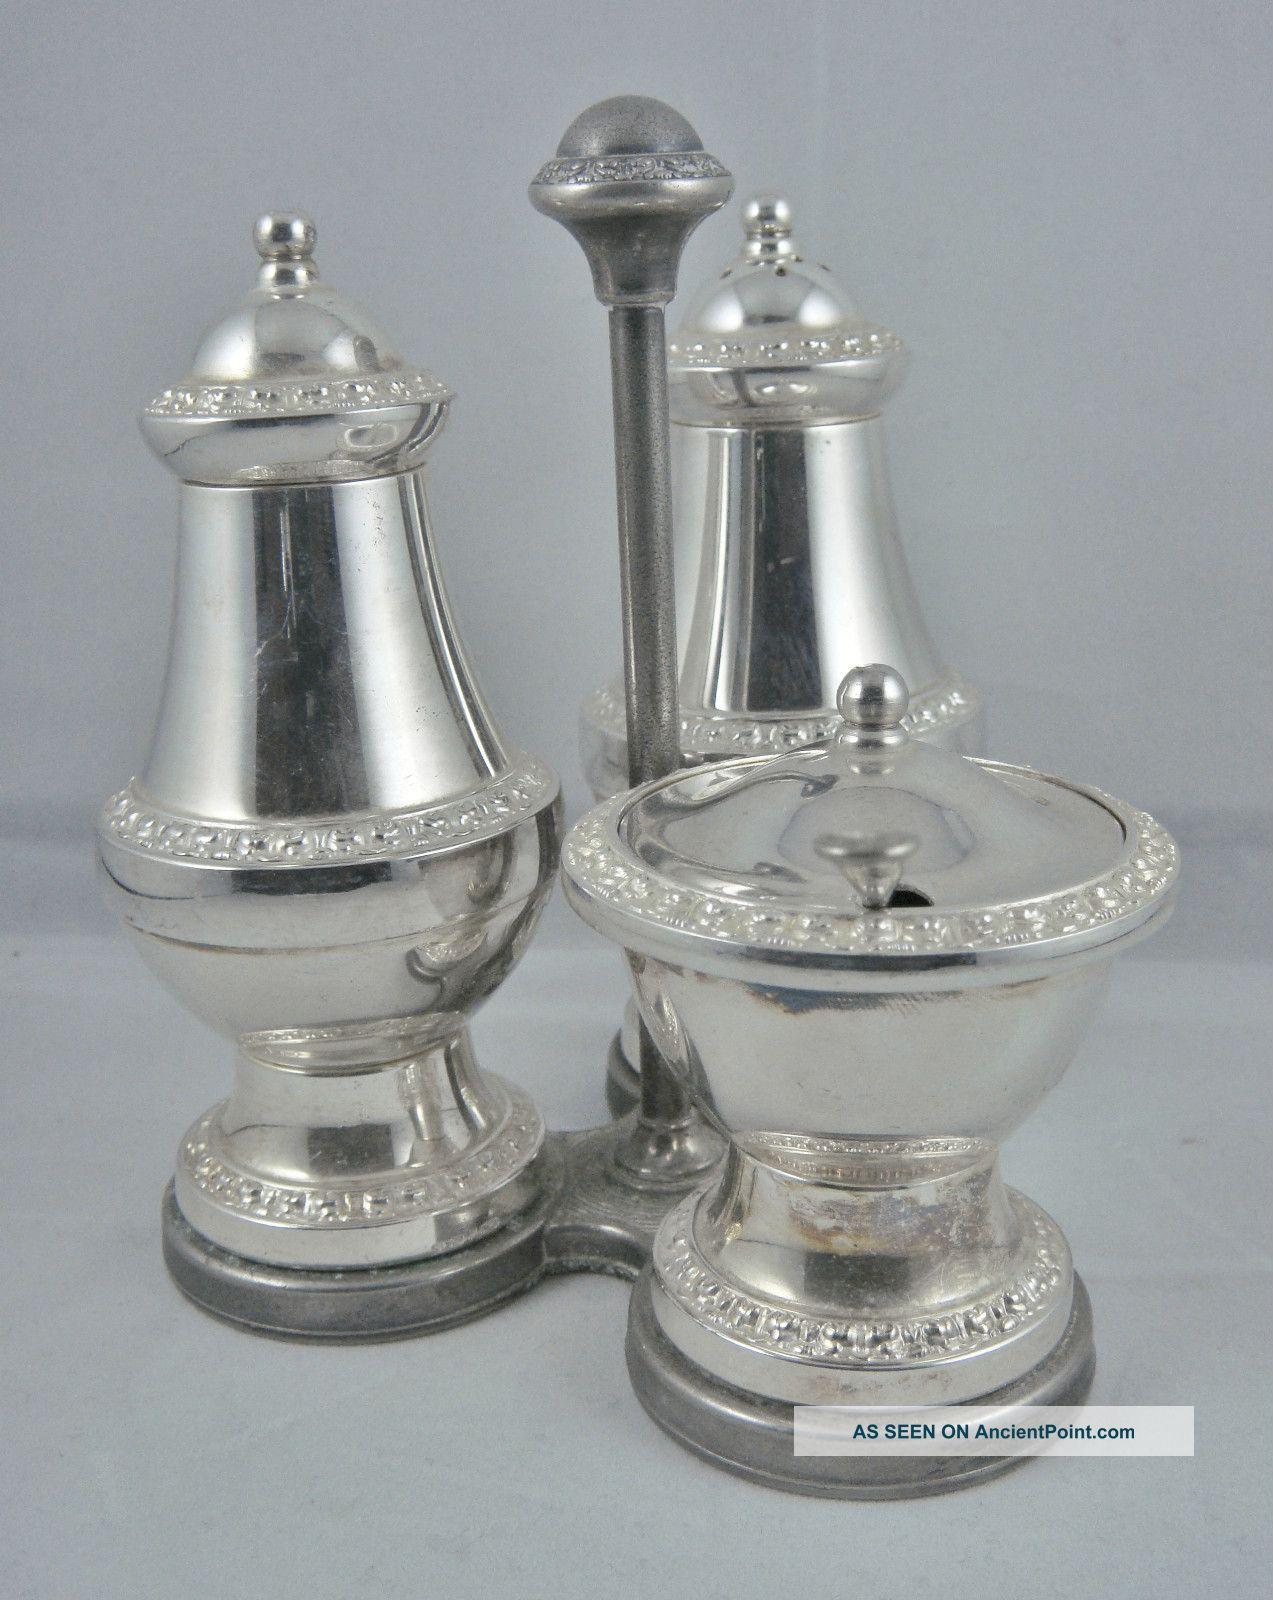 Lovely Vintage English Silver P Ornate Salt Pepper Shakers Mustard Pot Cruet Set Salt & Pepper Cellars/ Shakers photo